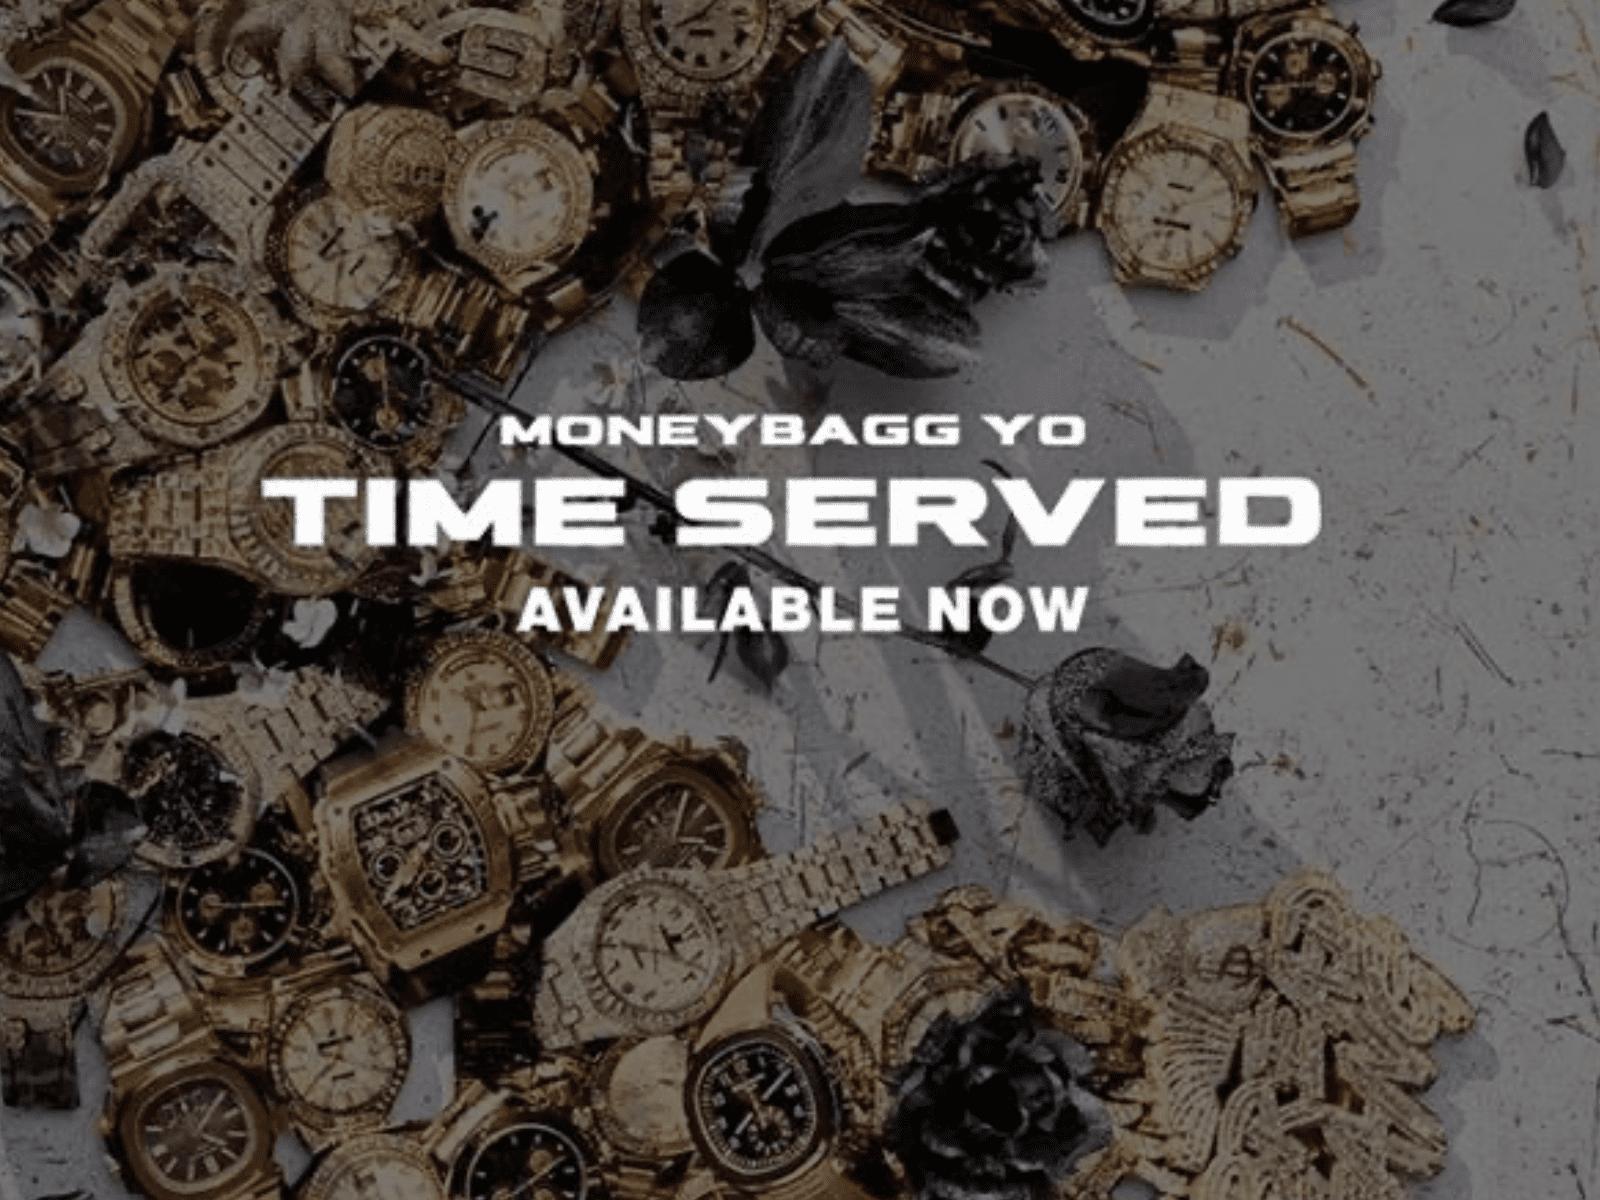 Moneybagg Yo Time Served